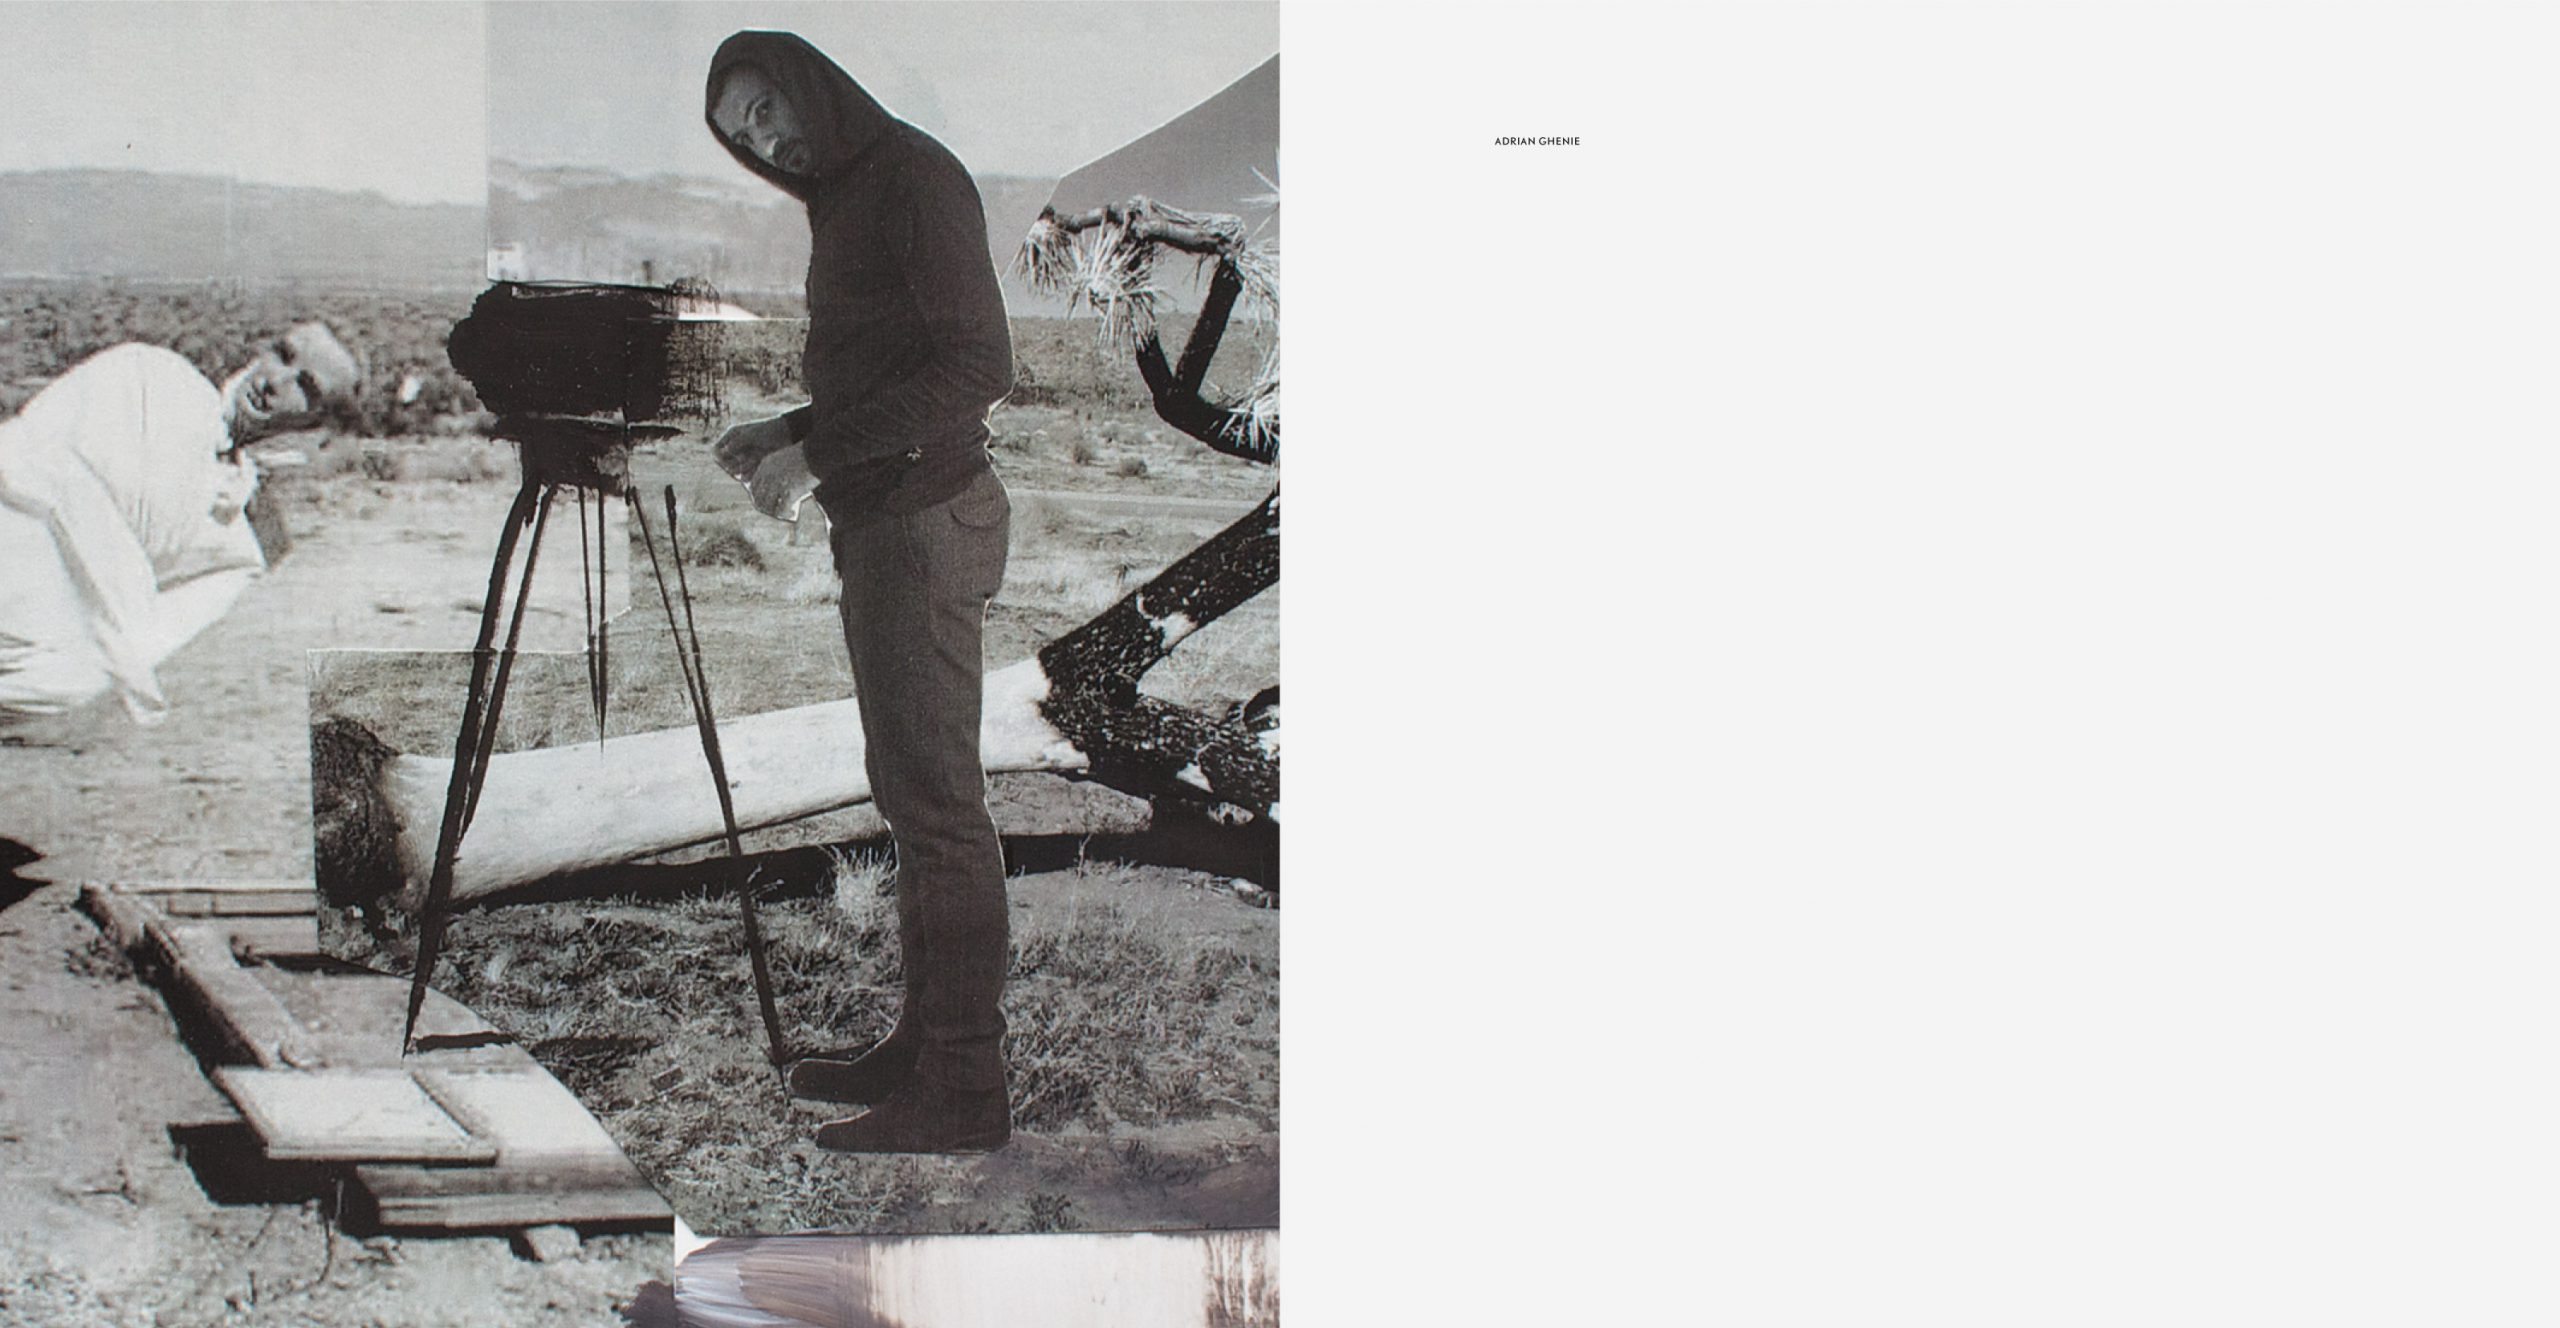 2014 Adrian Ghenie: Adrian Ghenie